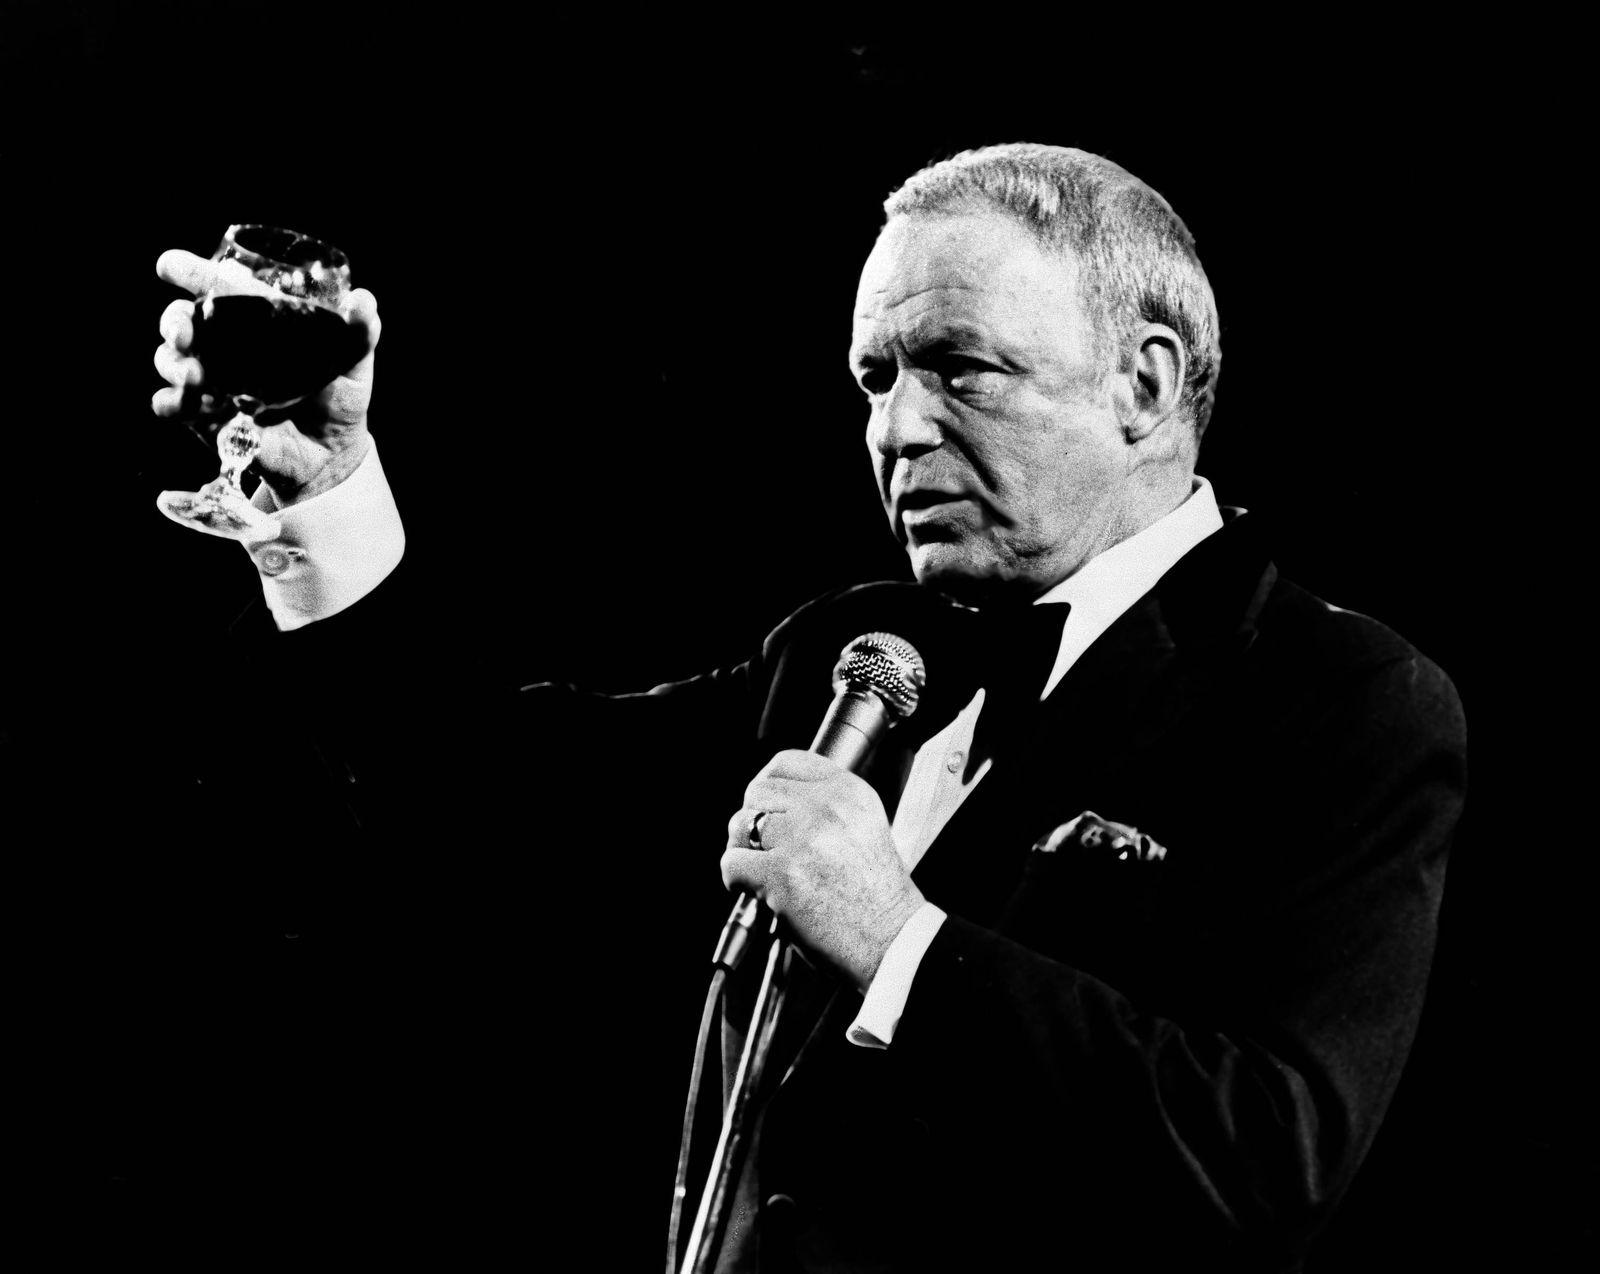 Claus Ogerman/ Frank Sinatra